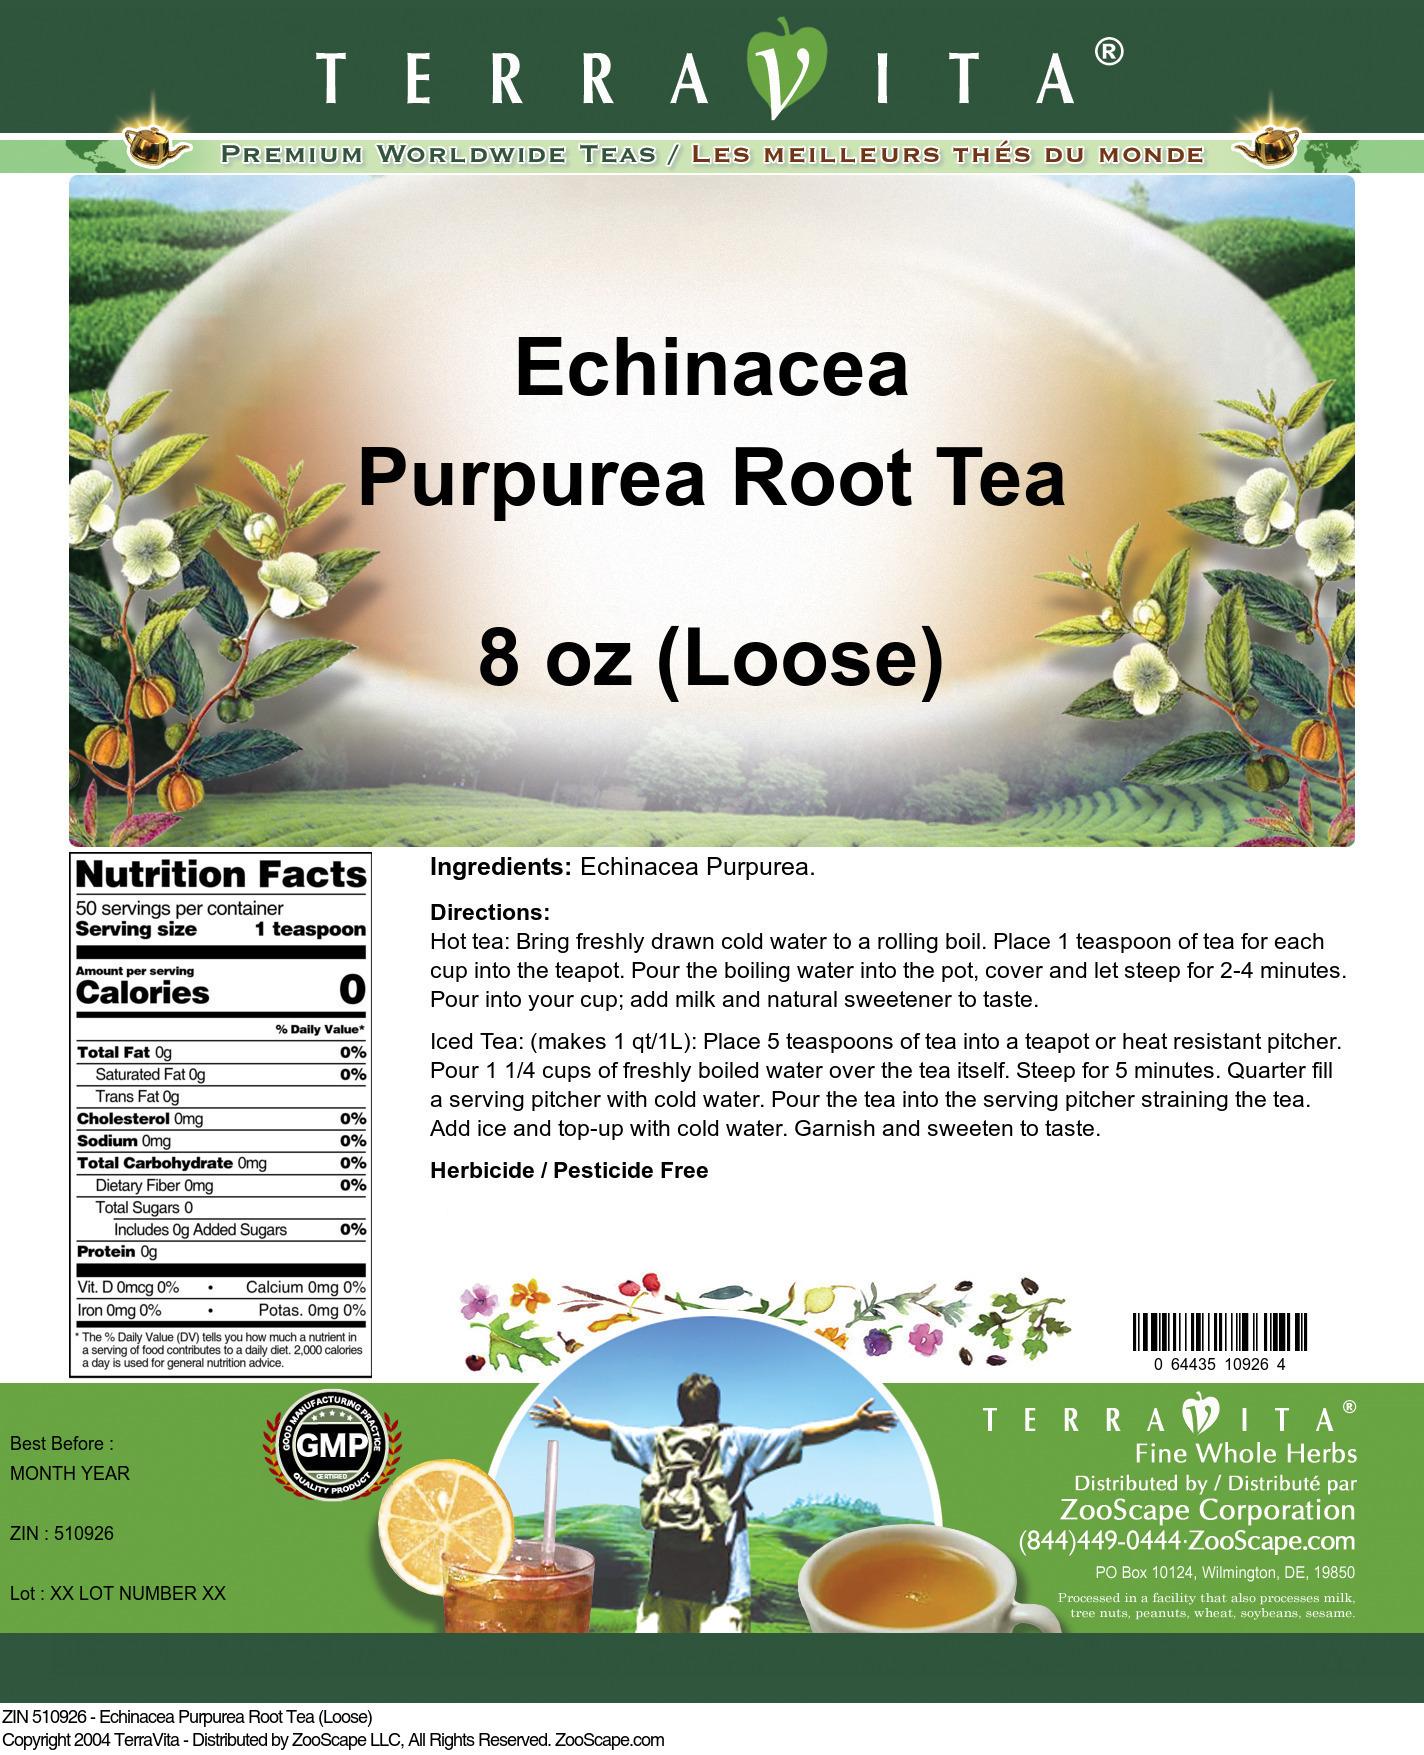 Echinacea Purpurea Root Tea (Loose)